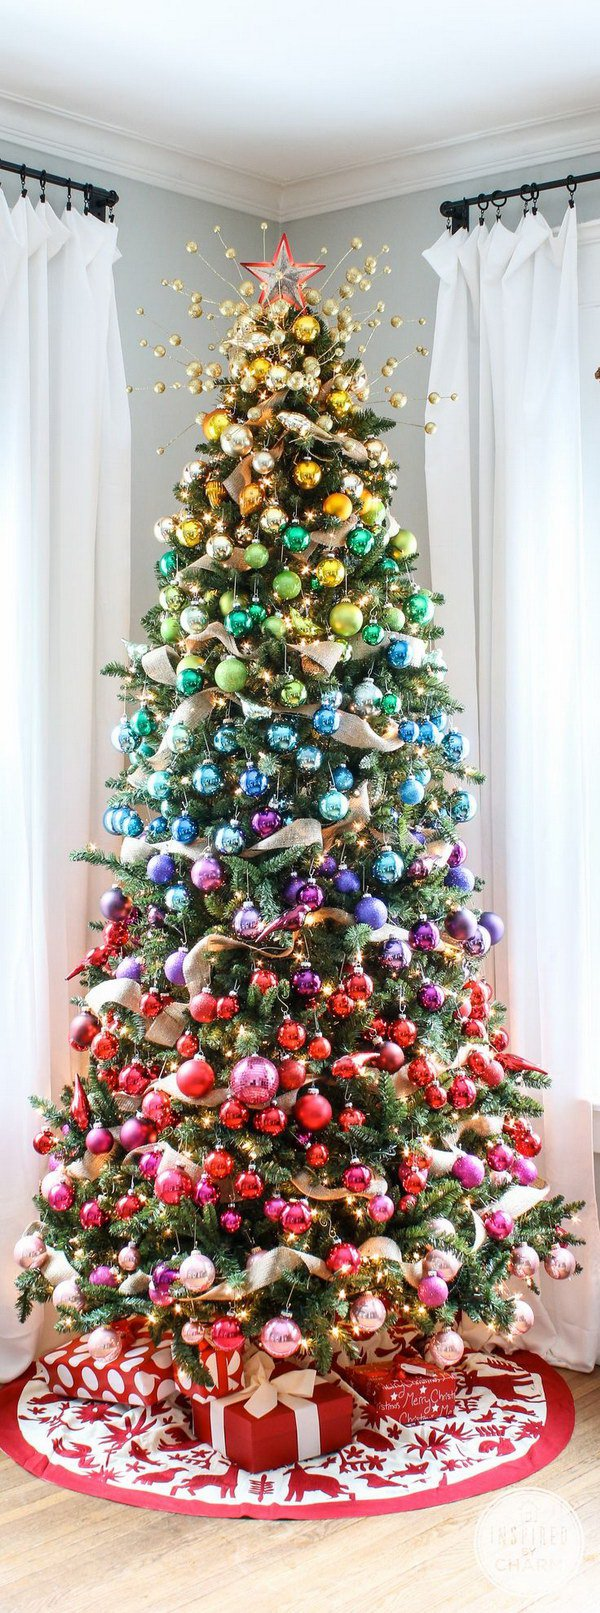 11-christmas-tree-decoration-ideas